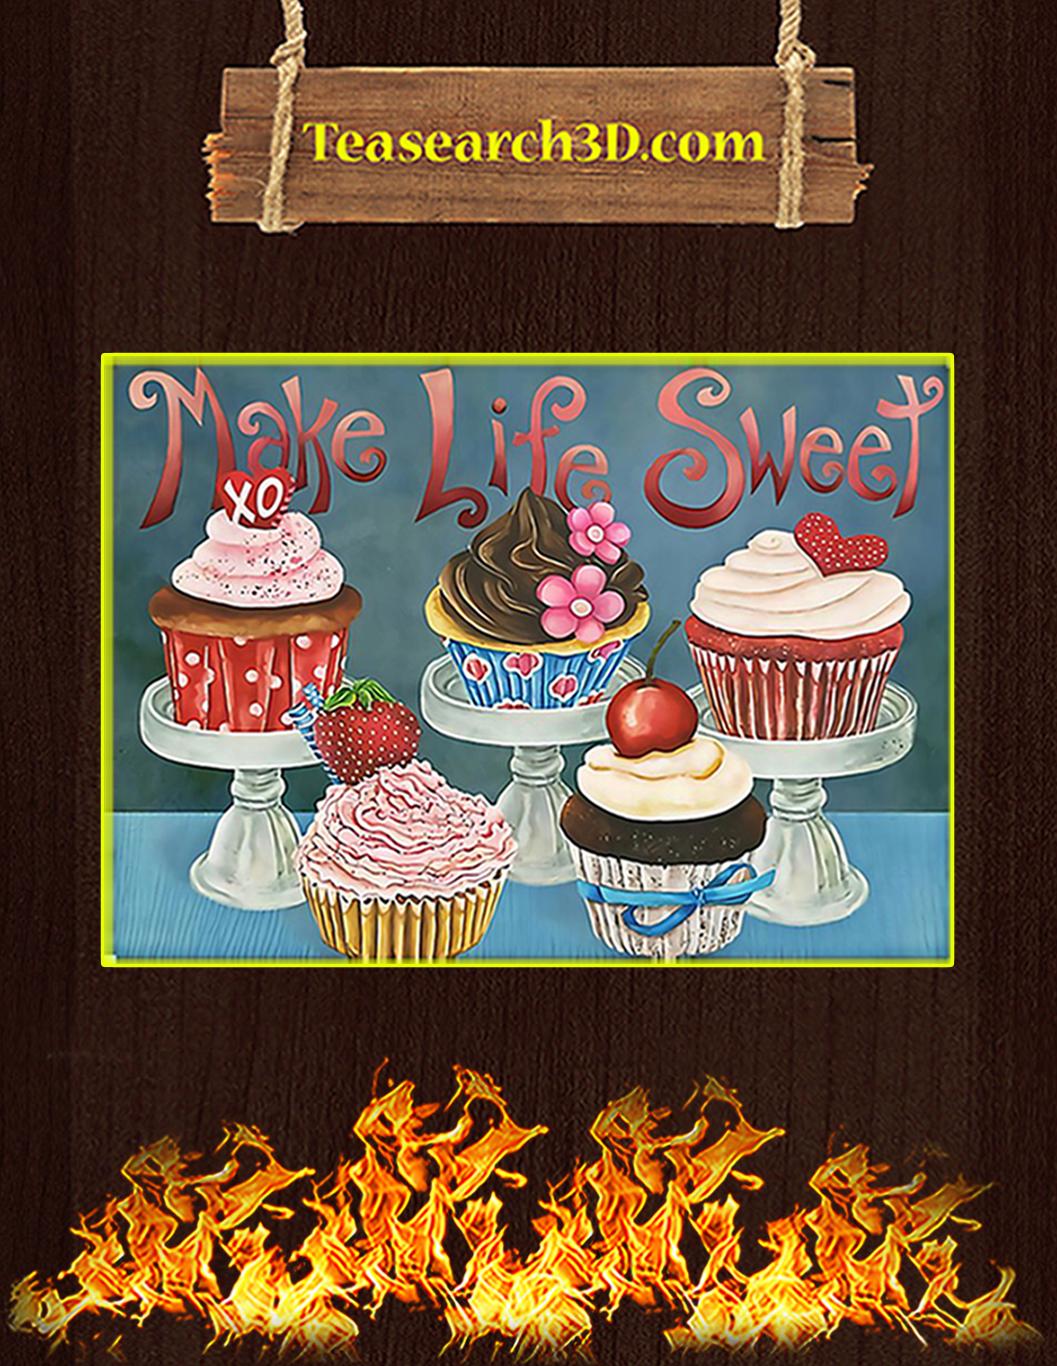 Baking make life sweet poster A1